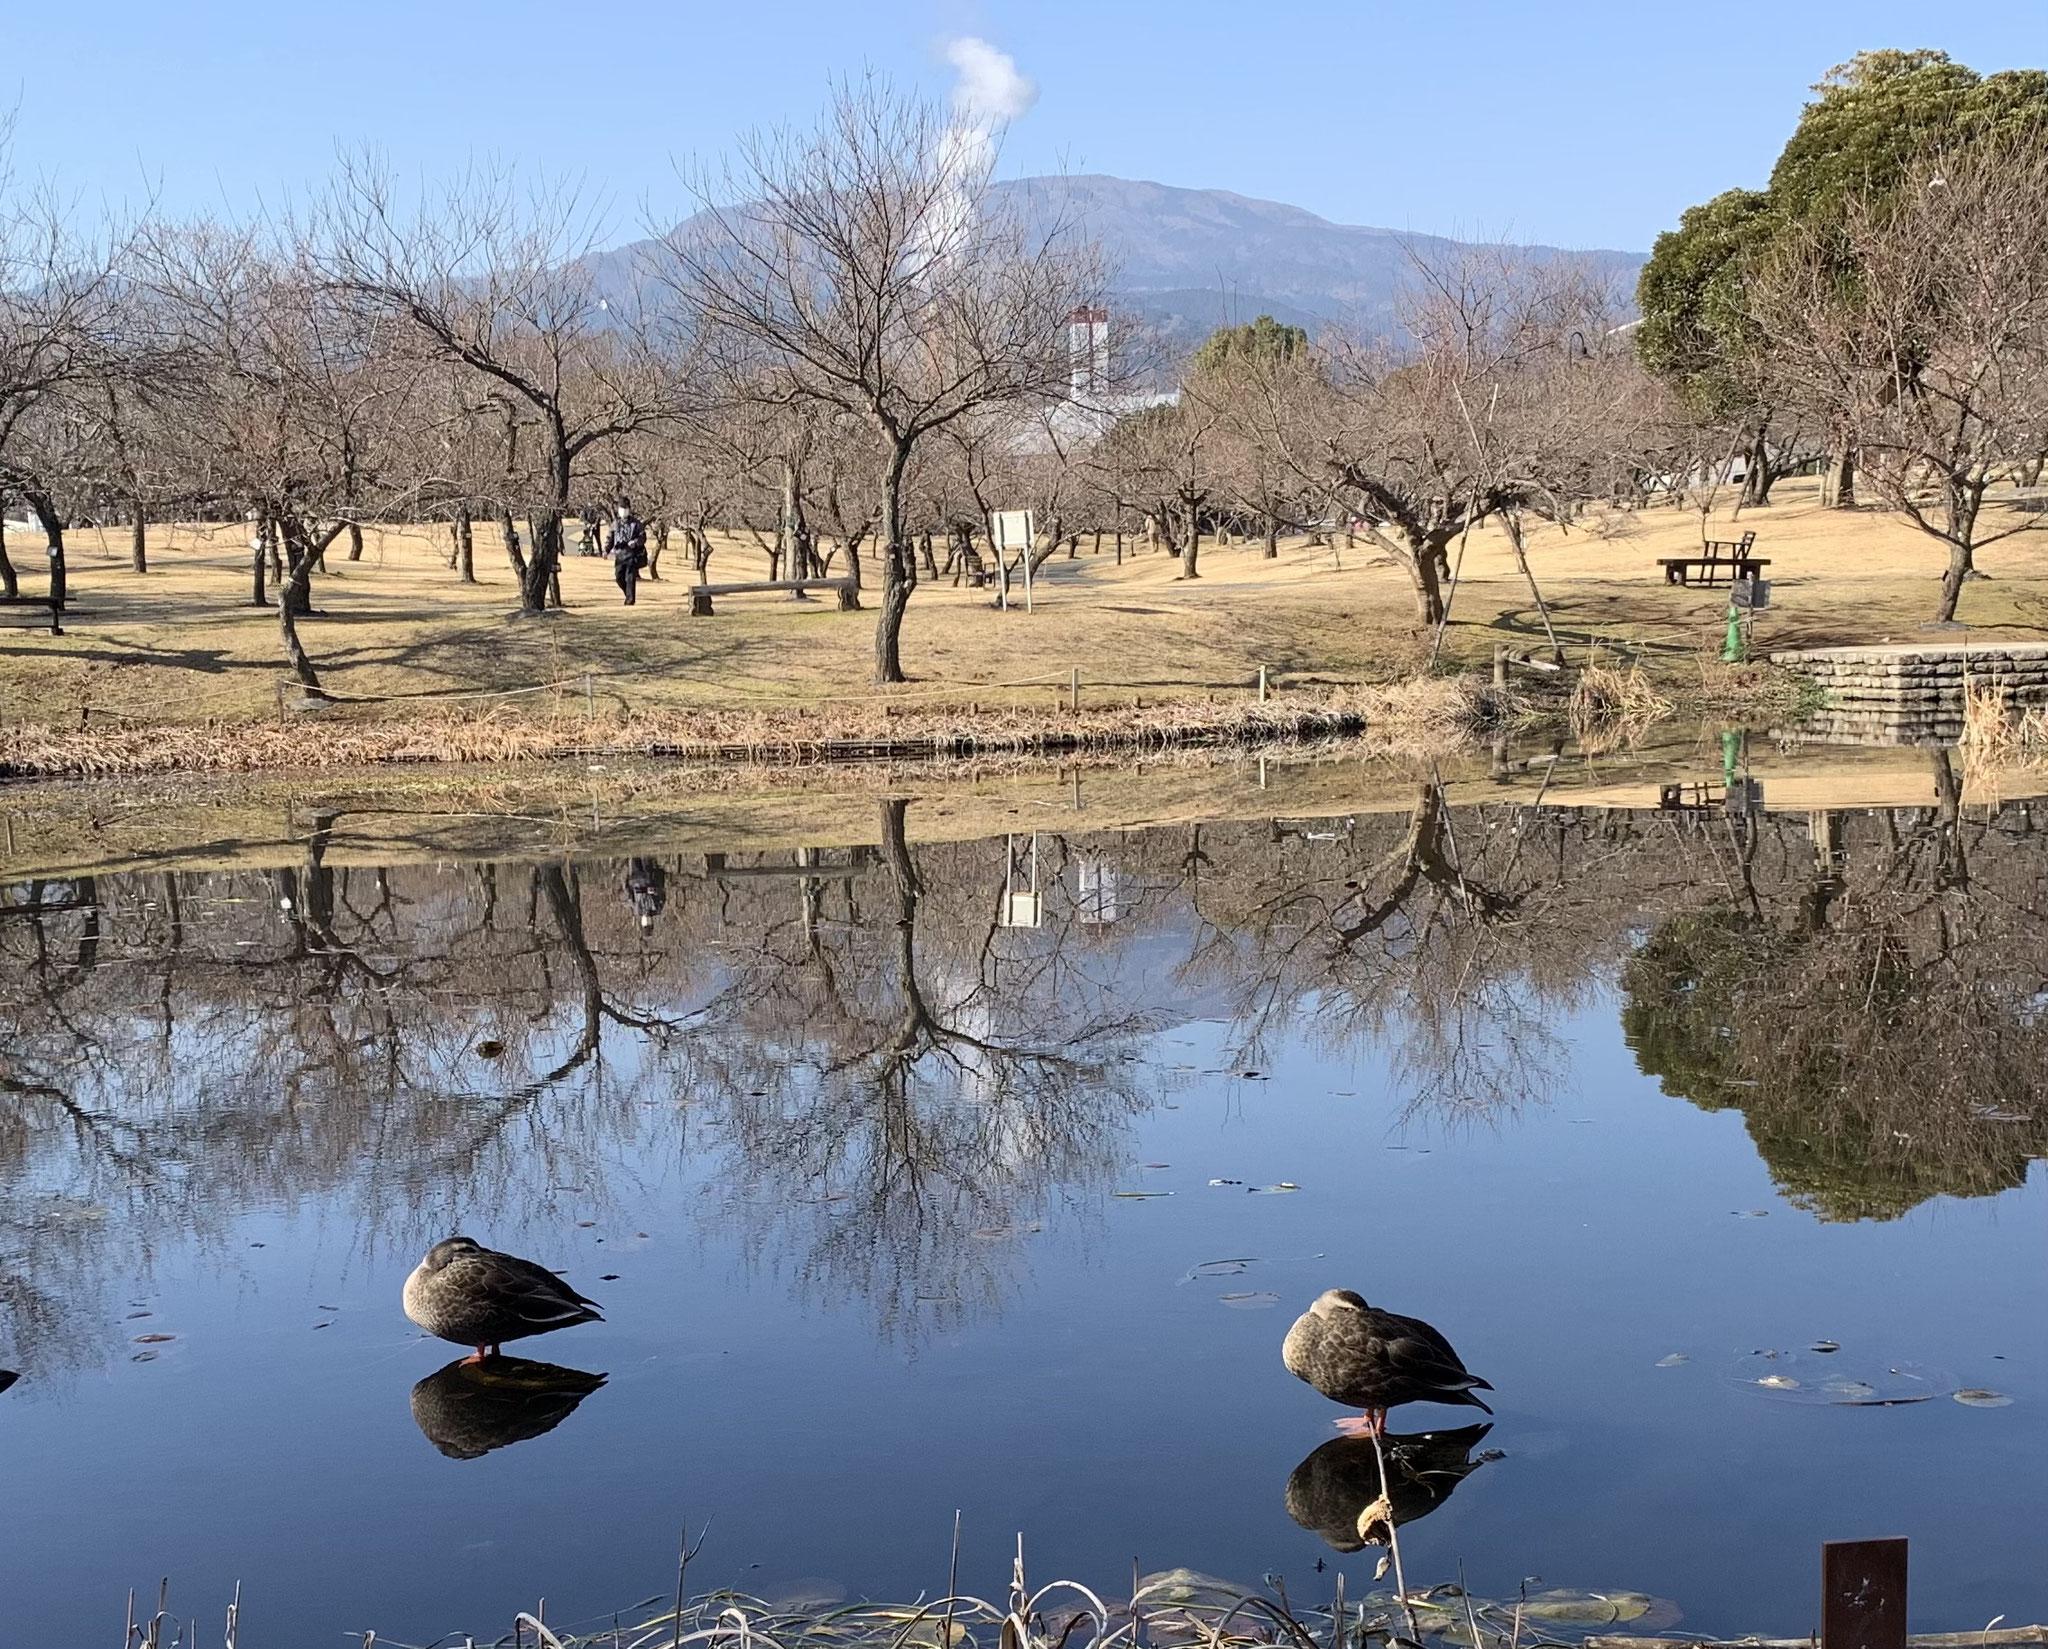 Photograph taken by Noriko Kimura